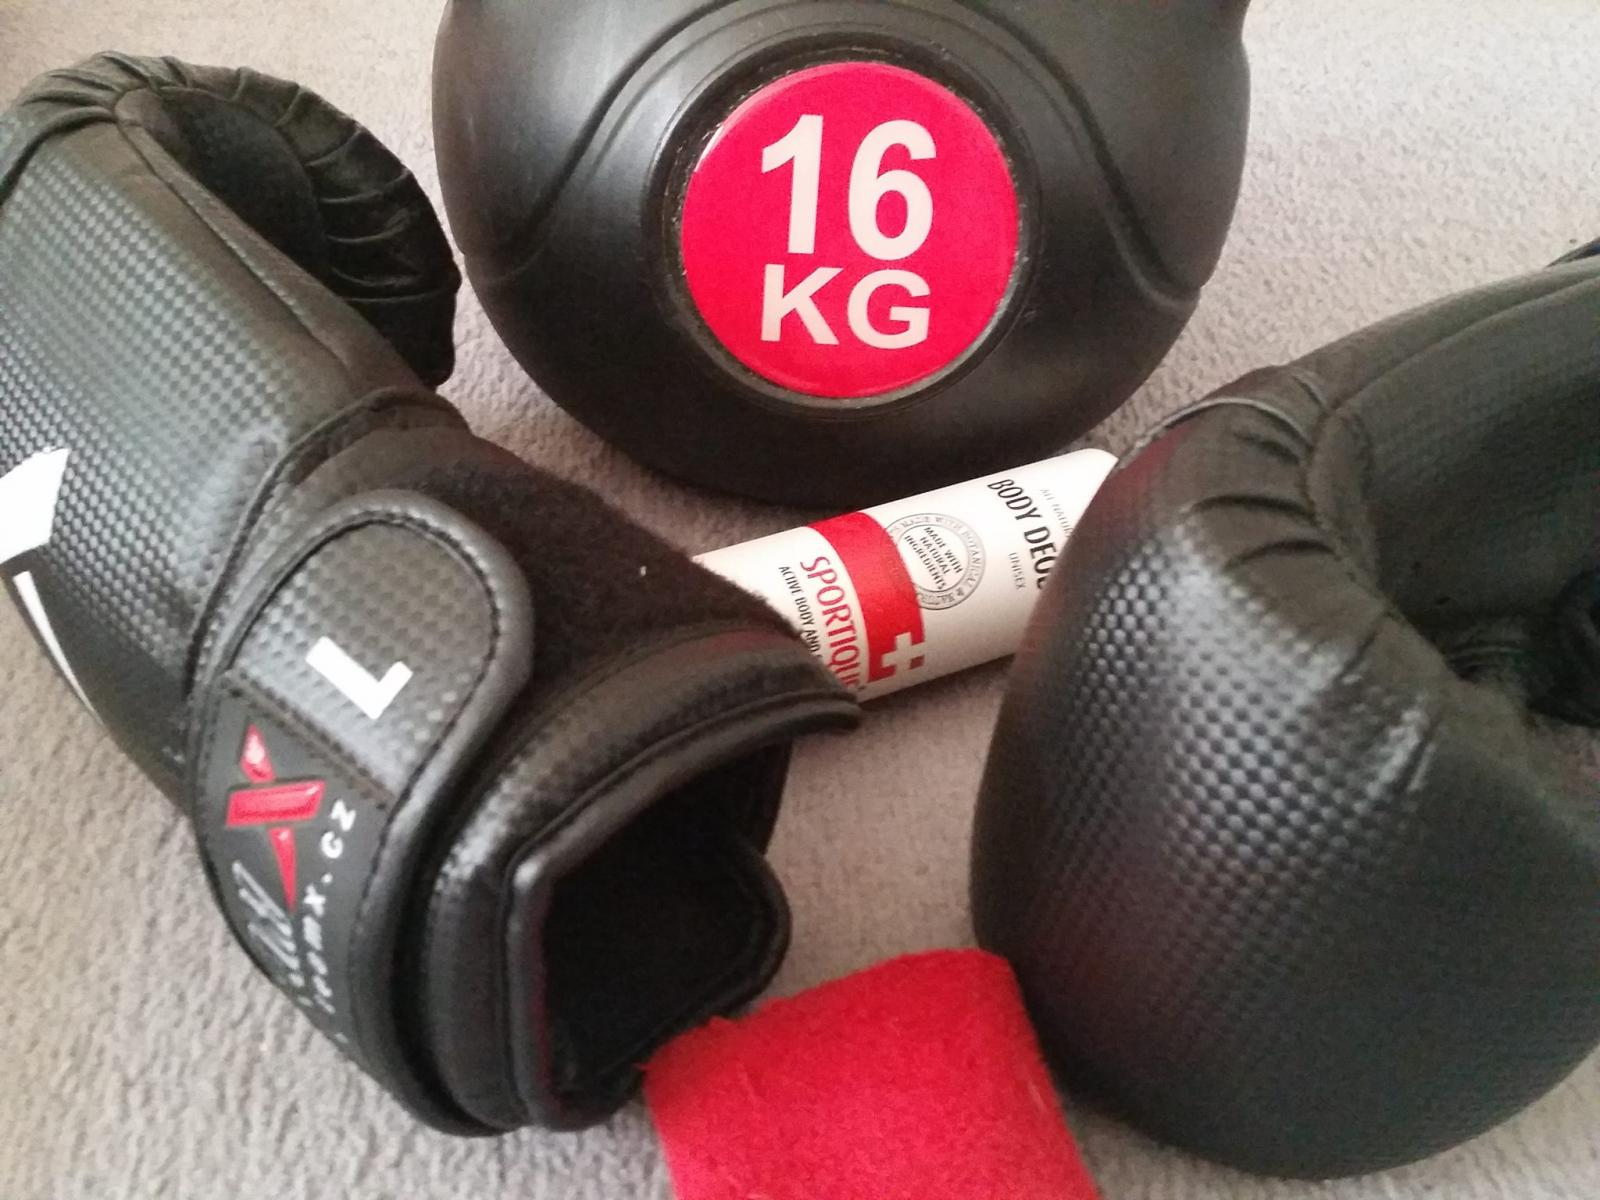 Recenze: Unisex deodorant od Sportique